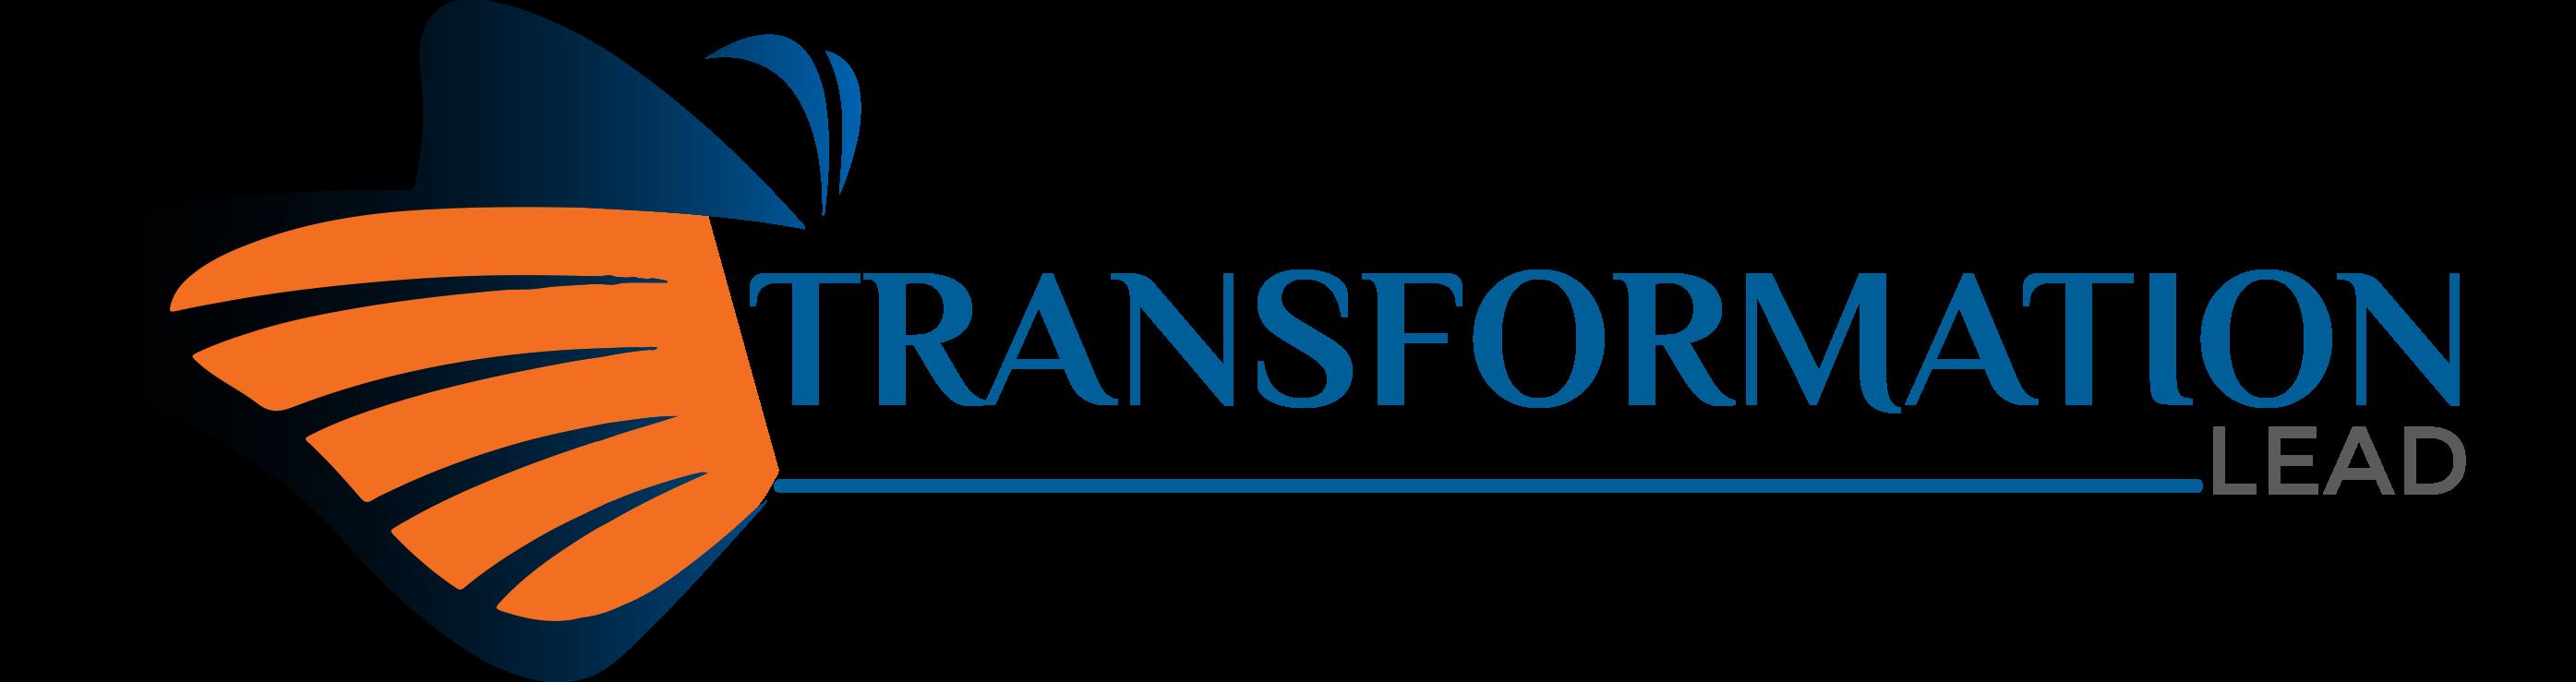 Transformation Lead